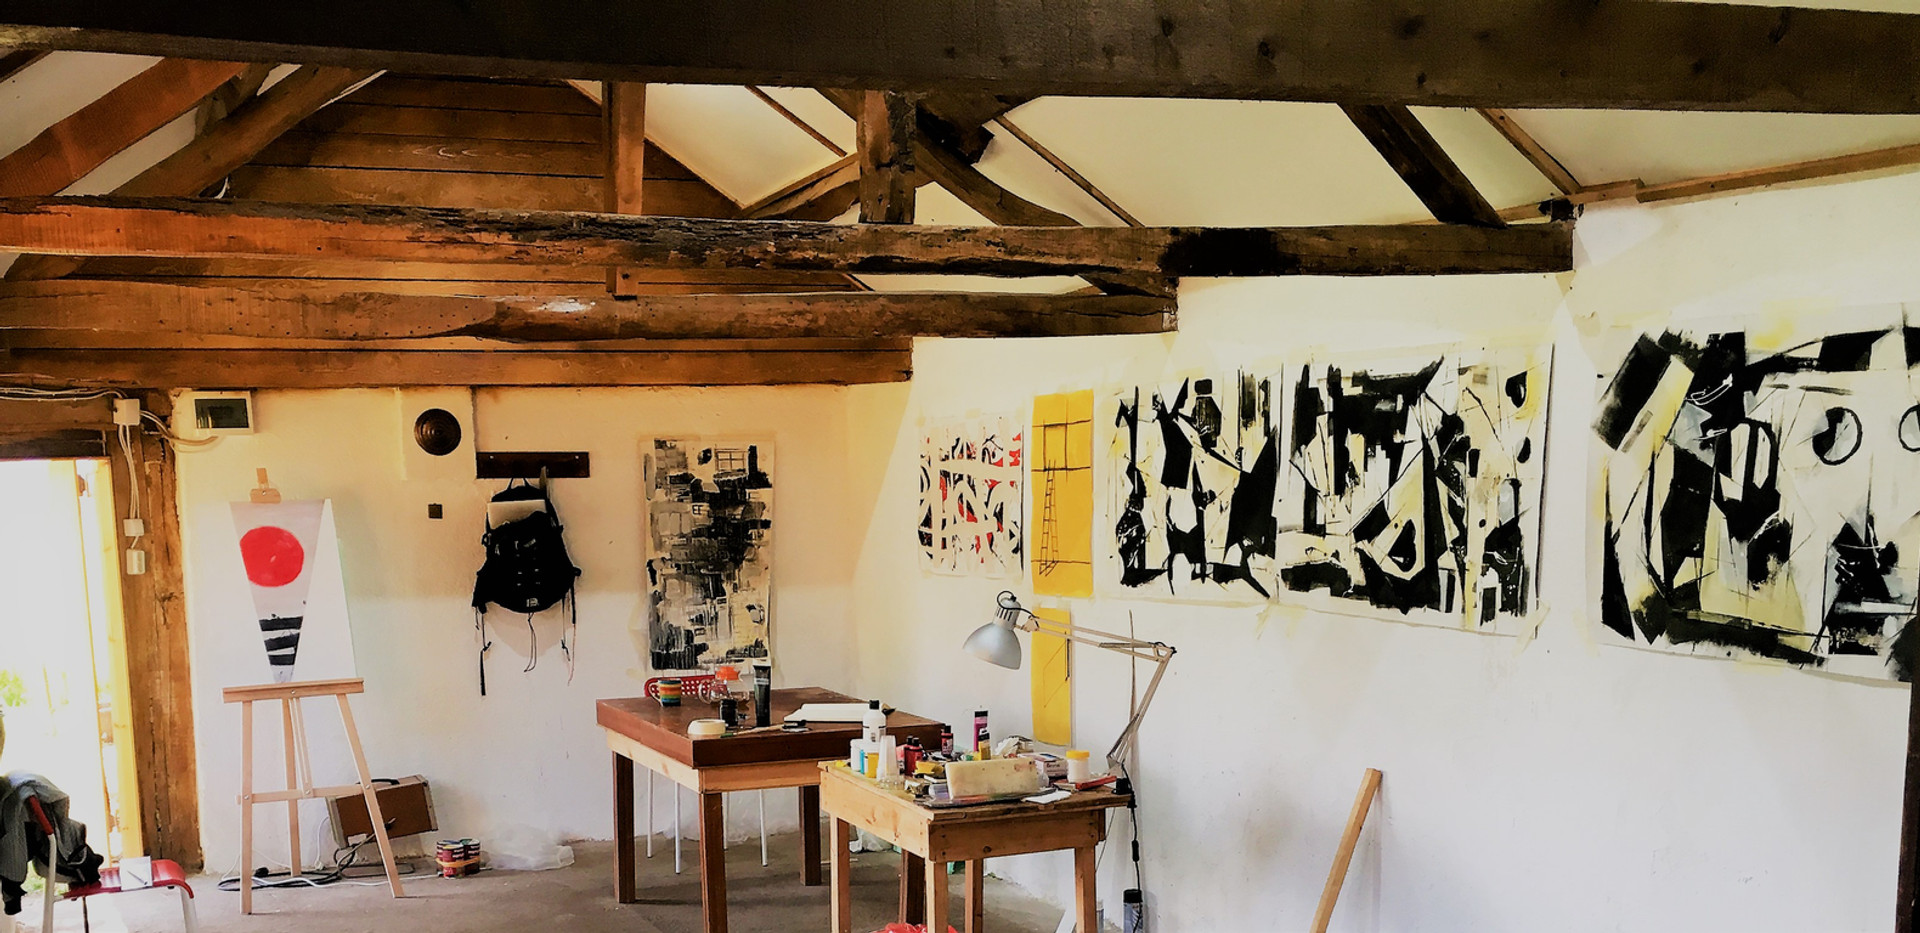 IMAGO - The Inside of the Big Studio Dur